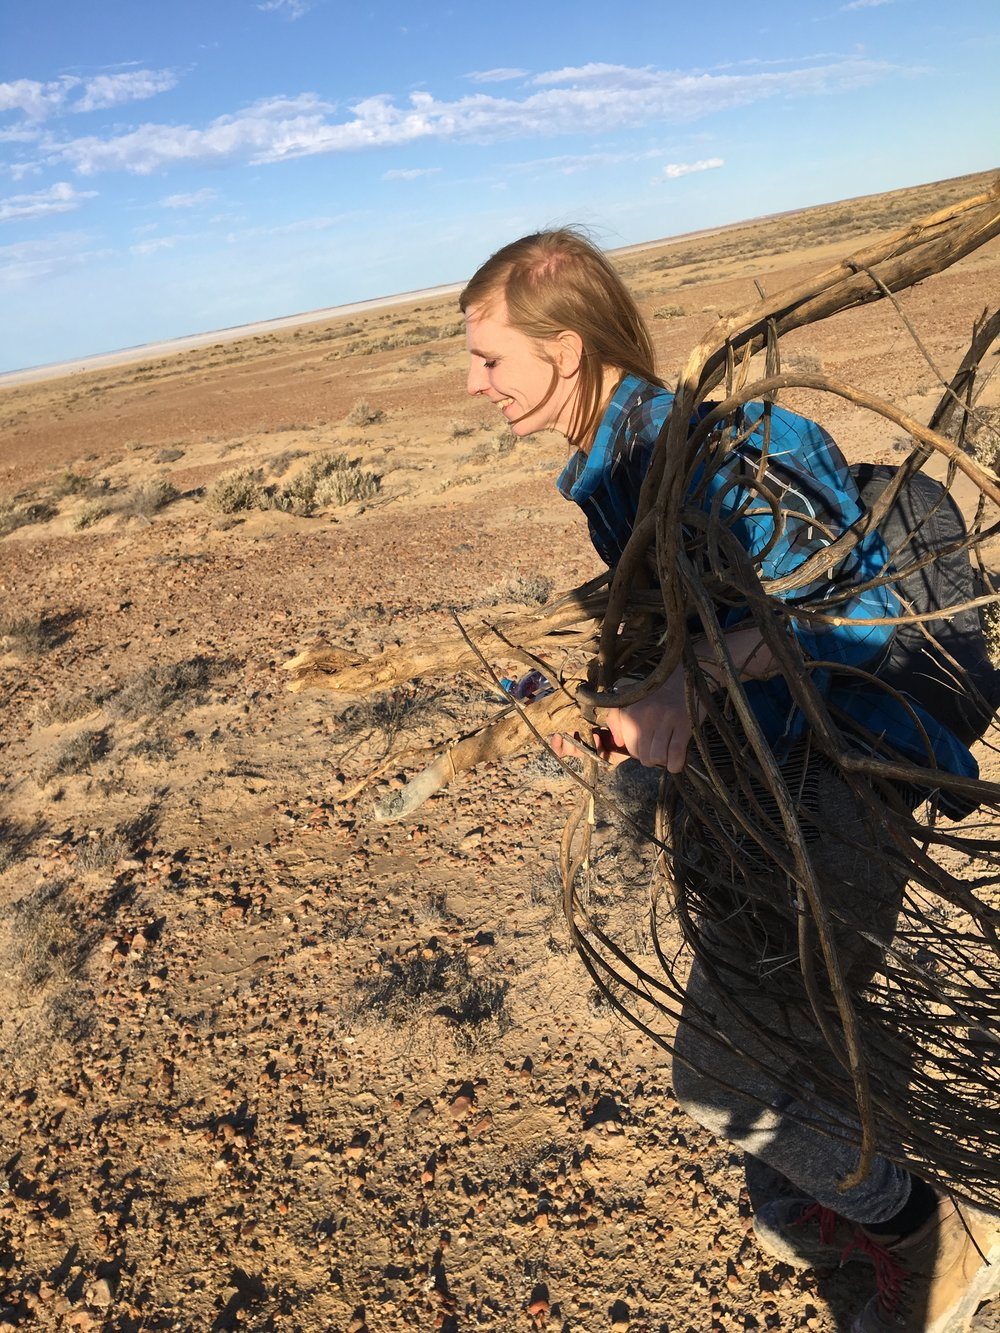 Carrying strange found desert objects.